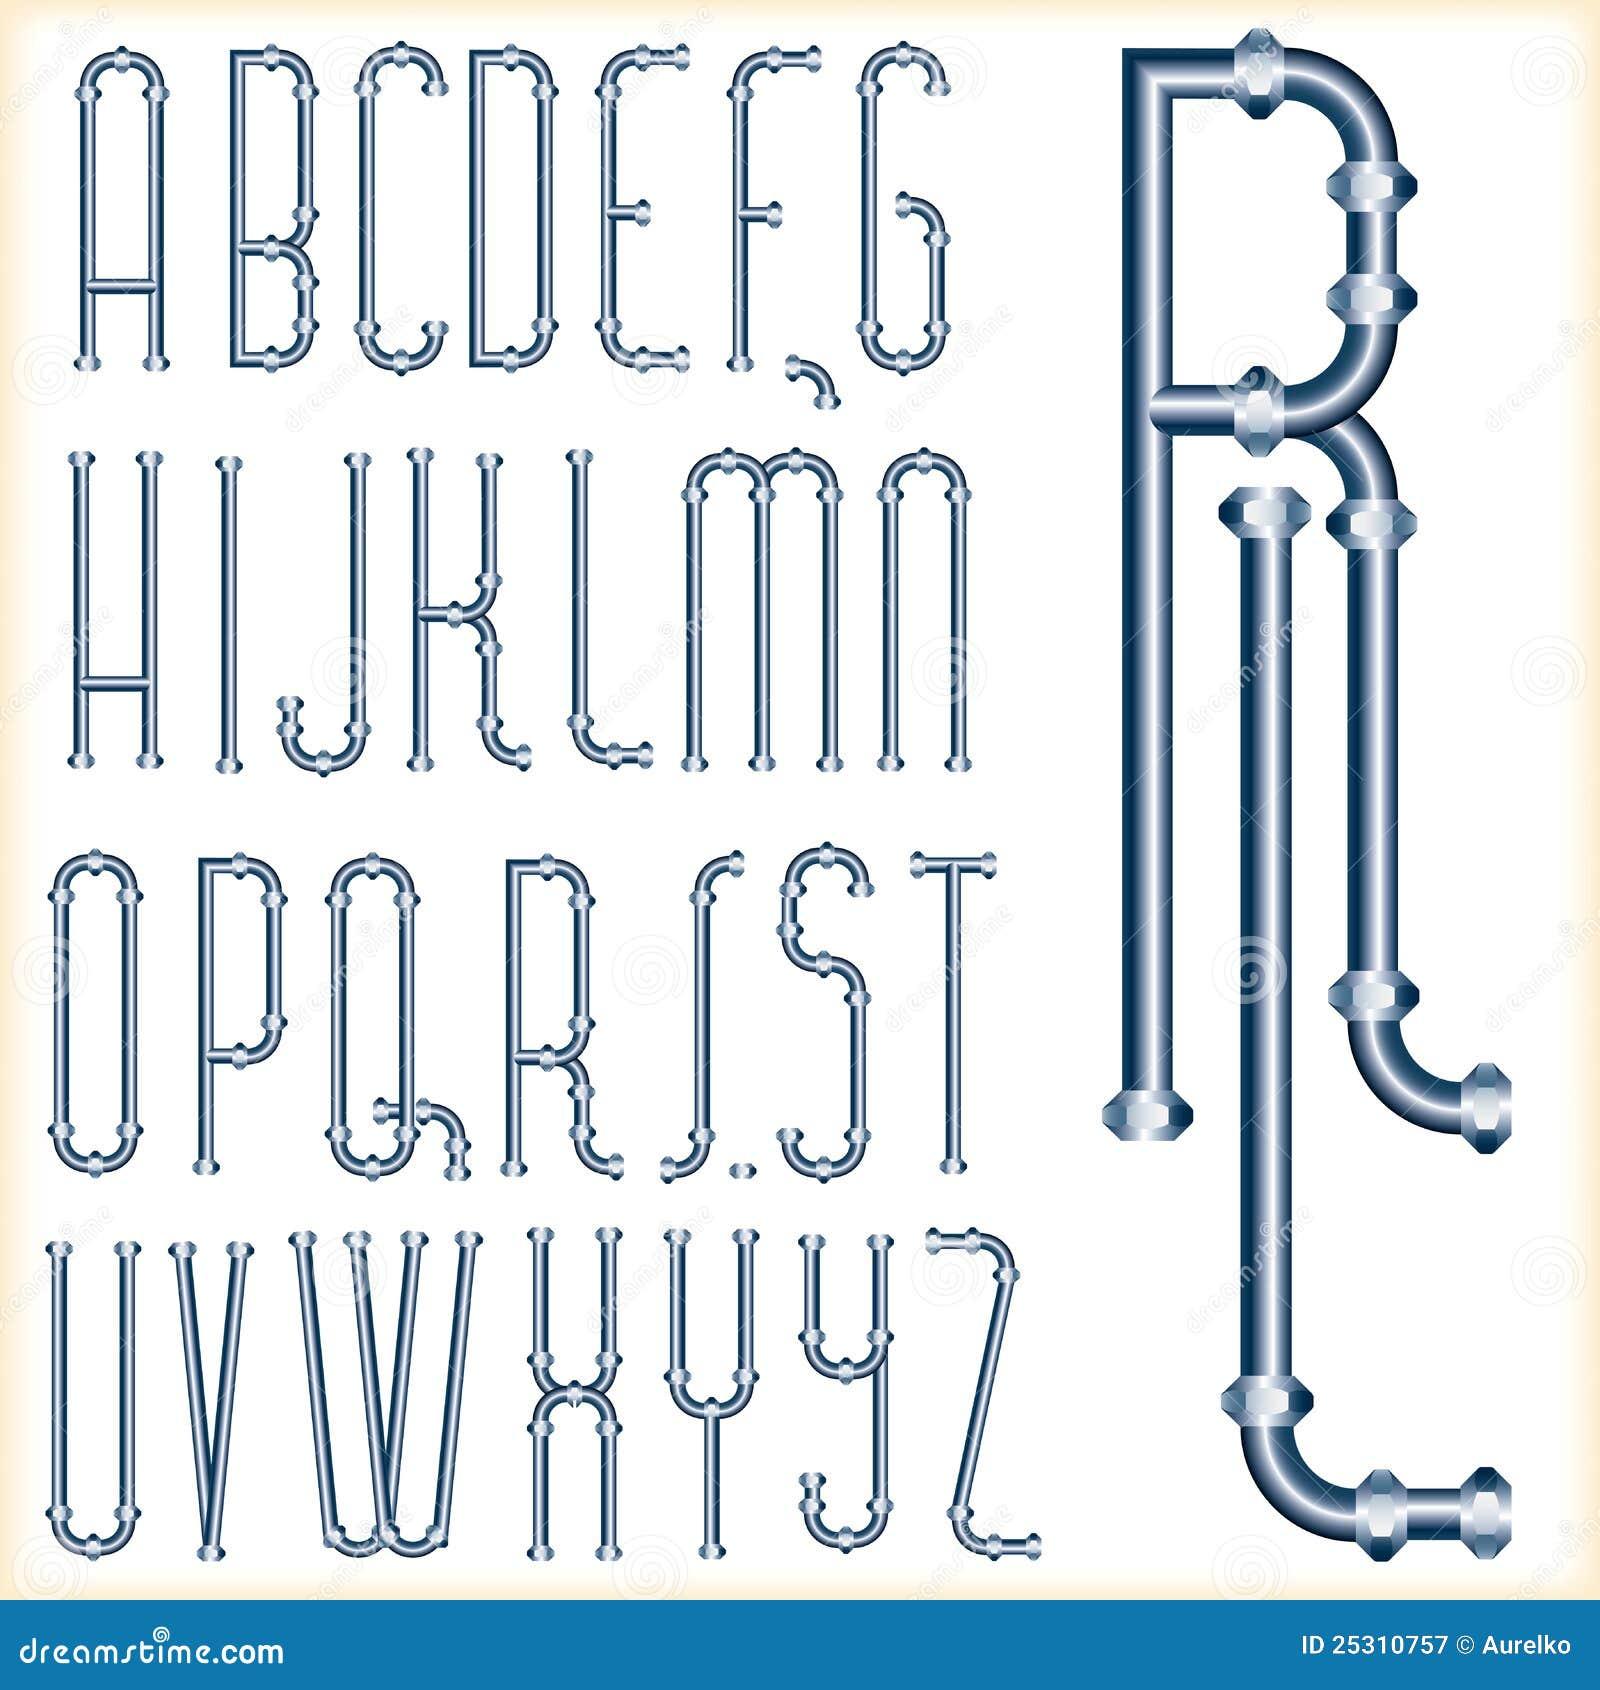 Blue Tube Font Royalty Free Stock Photography Image